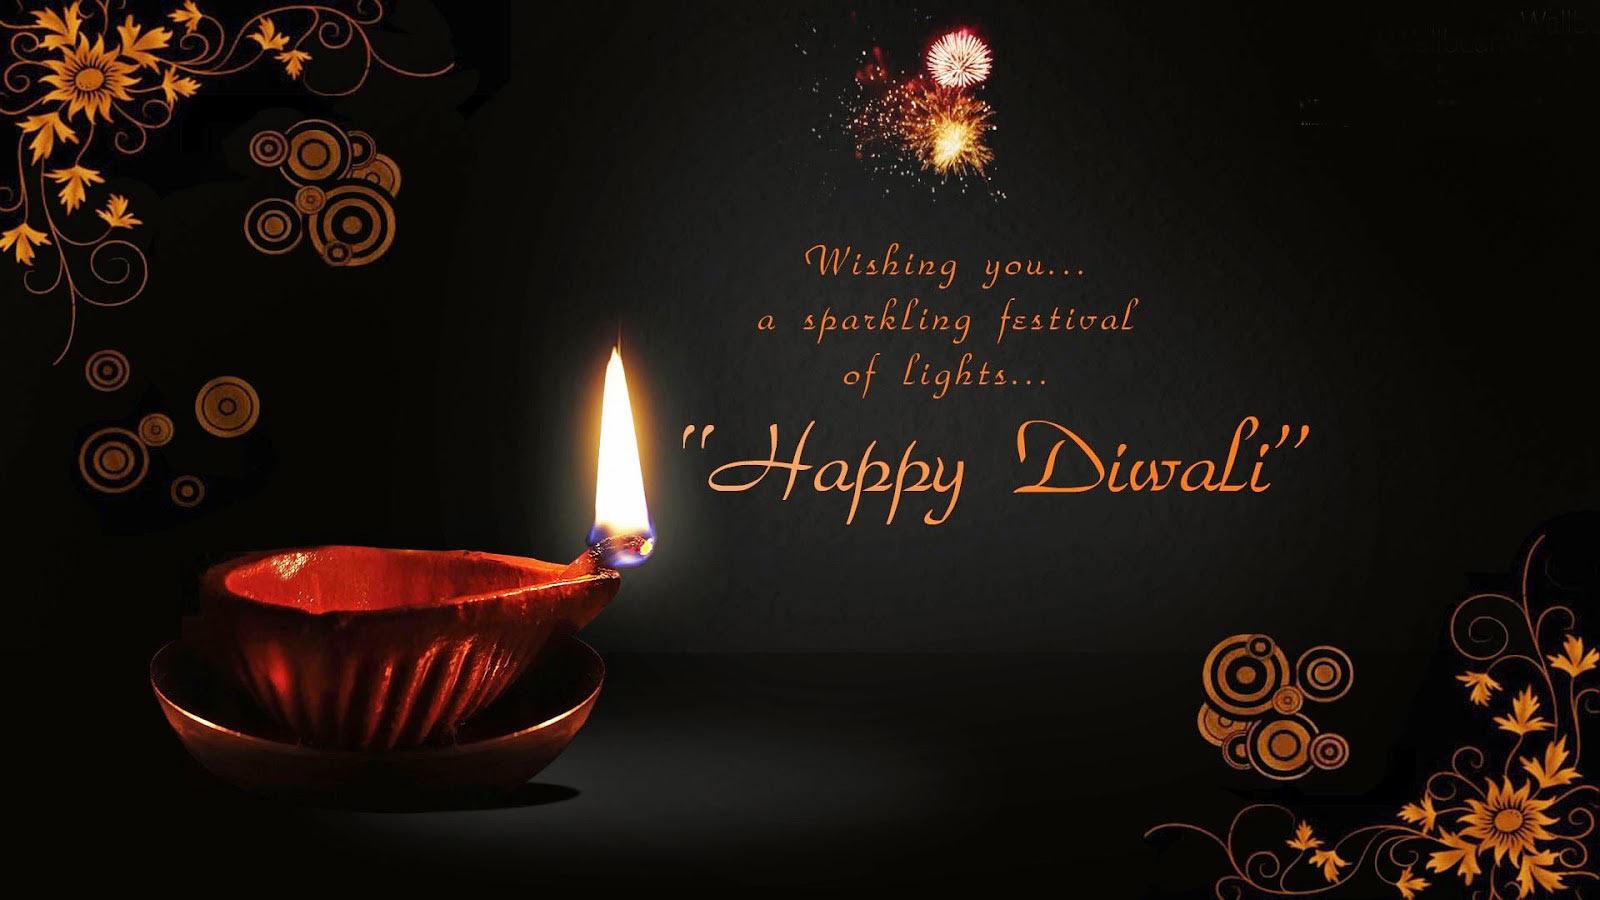 Diwali Pictures, Diwalifestival.org